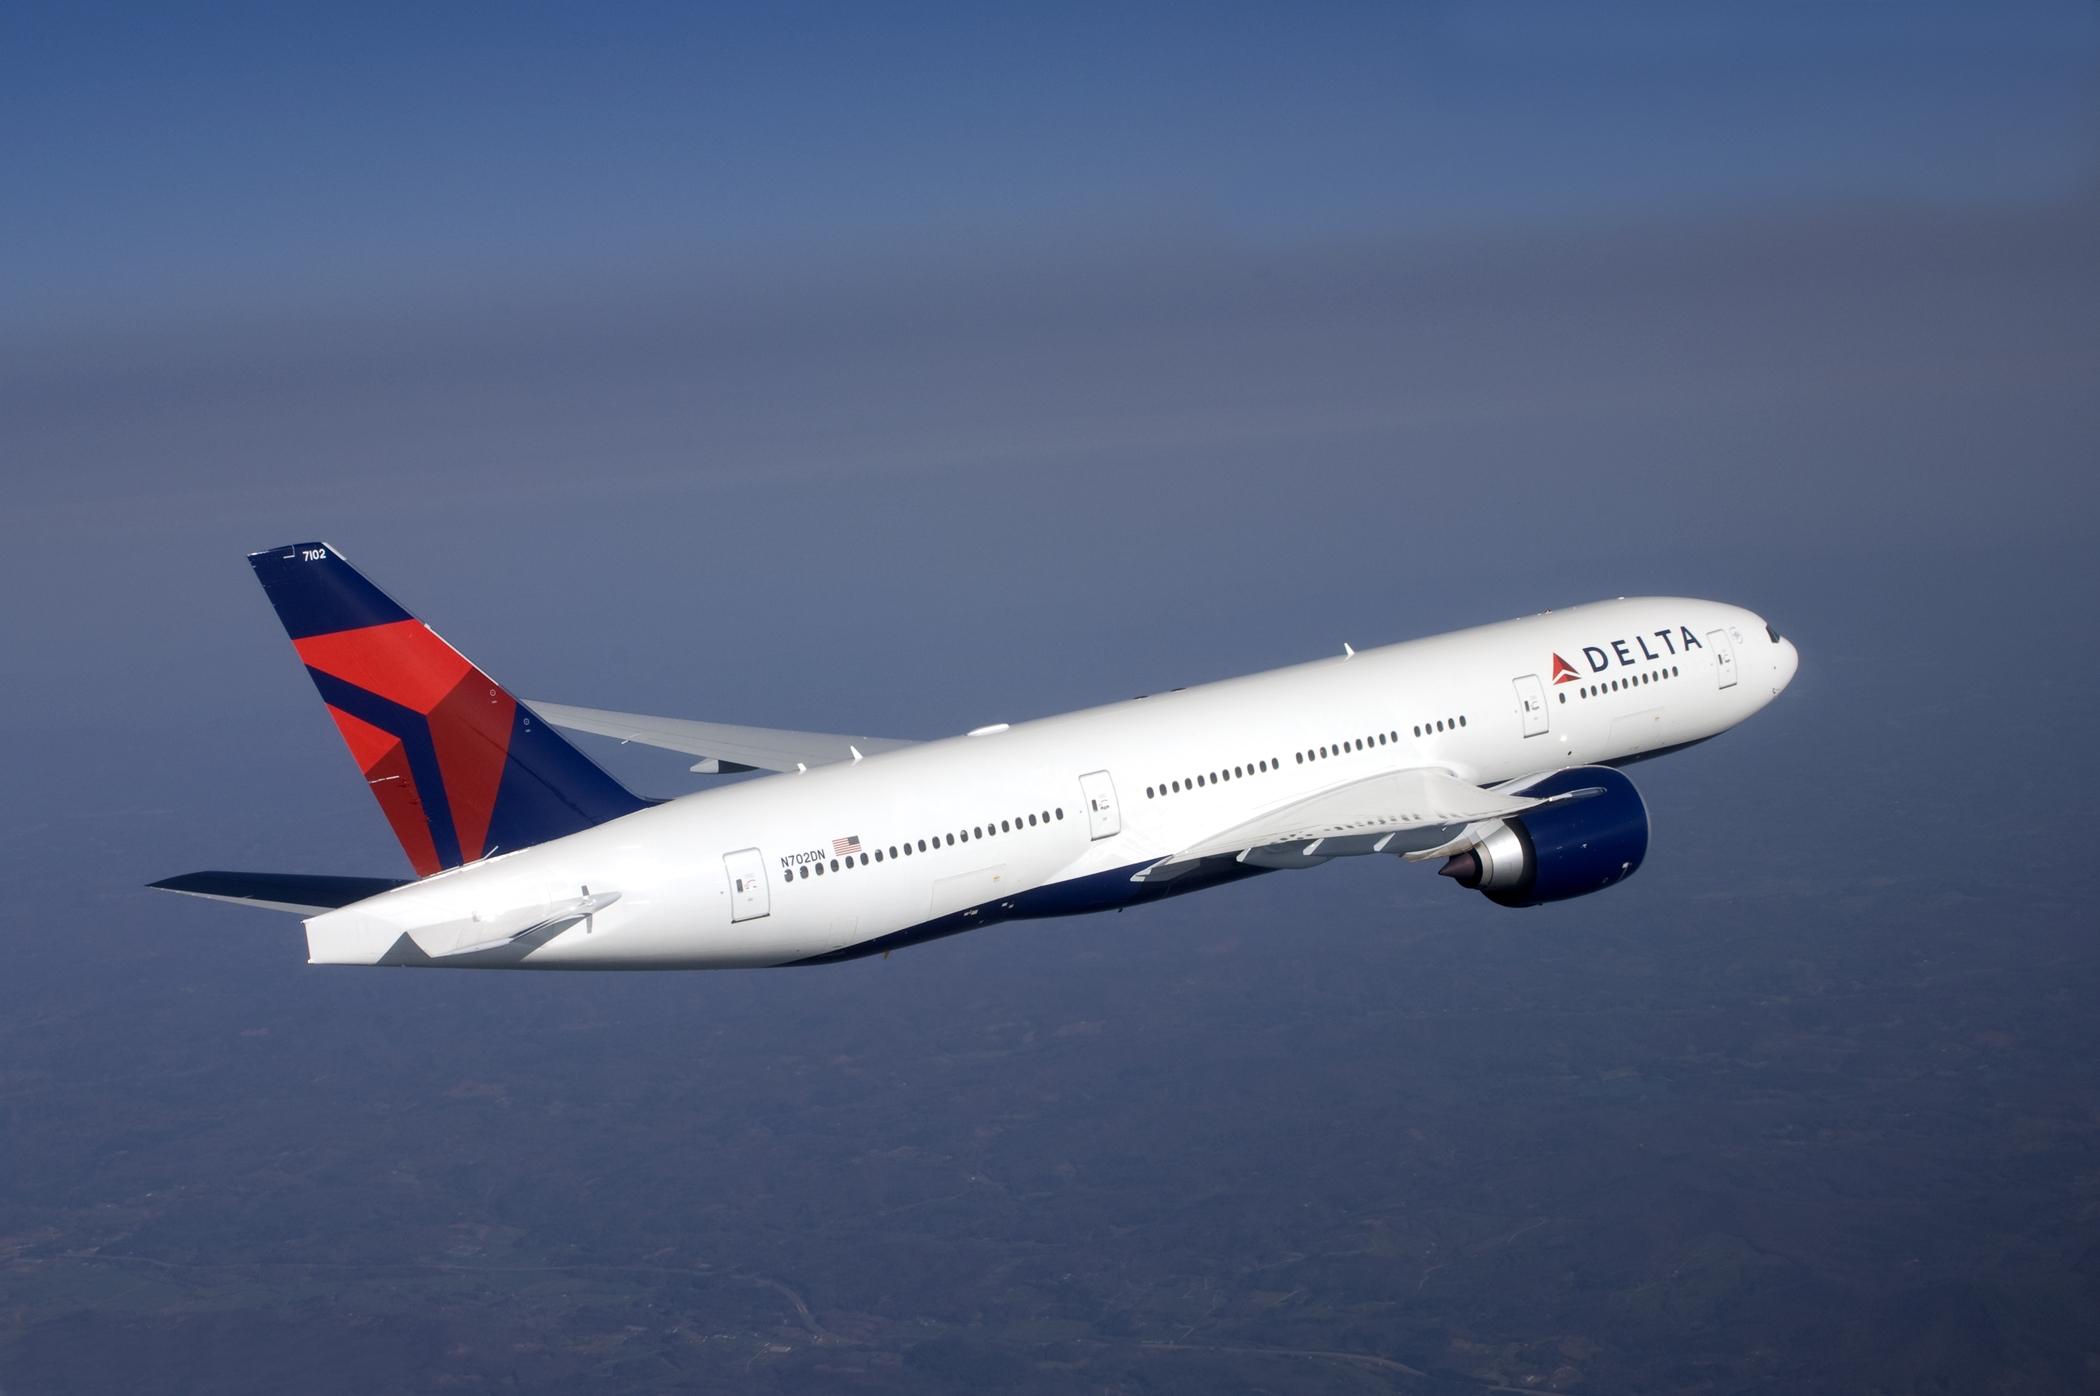 Boeing 777 fra Delta Air Lines. (Foto: Delta Air Lines | PR)